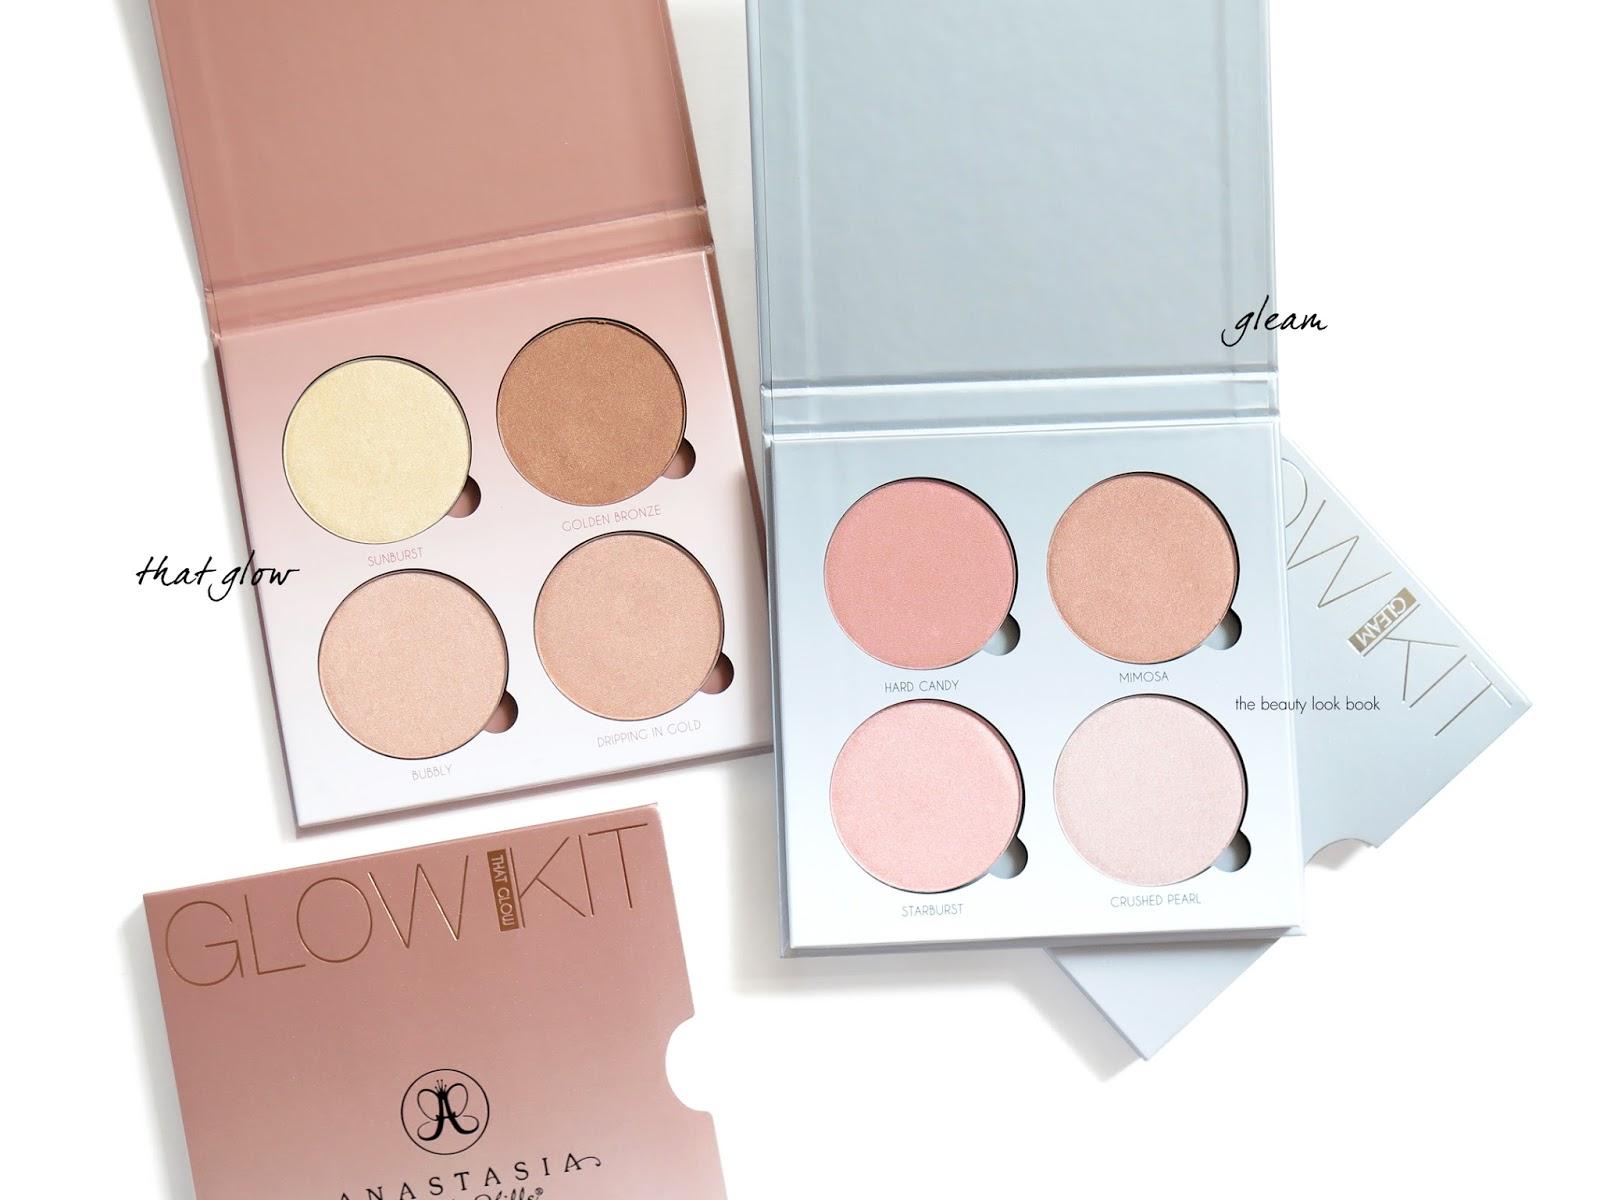 Anastasia Glow Kits in That Glow and Gleam no flash.jpg